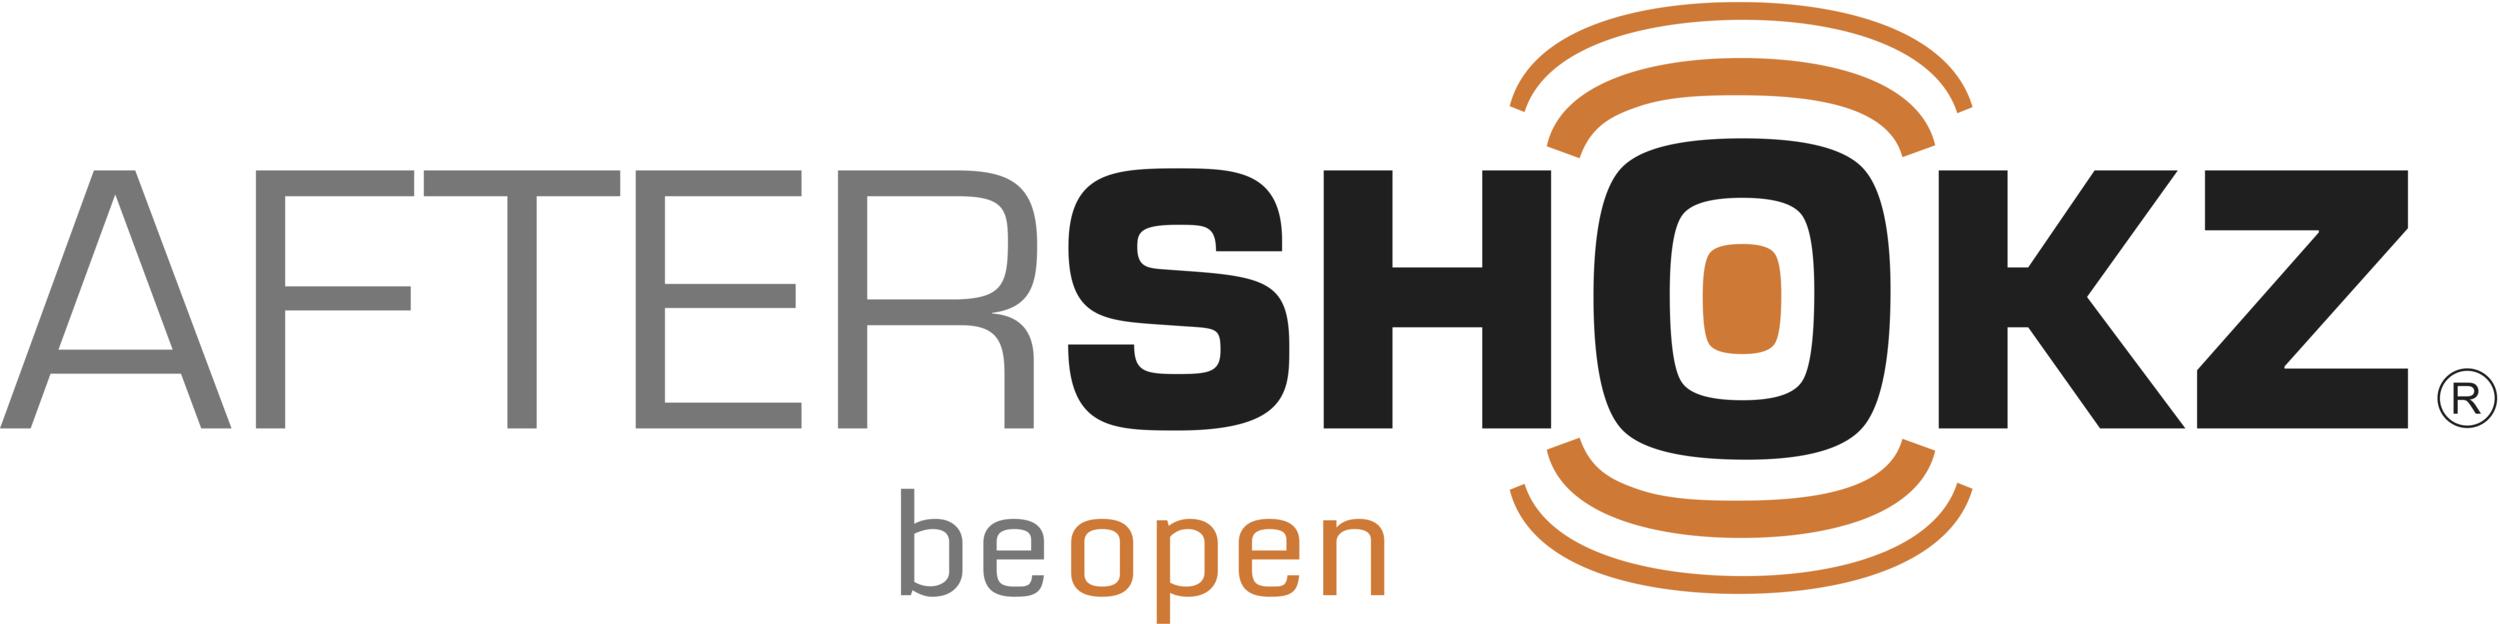 AfterShokz_Logo_Tagline_Transparent_Background copy.png